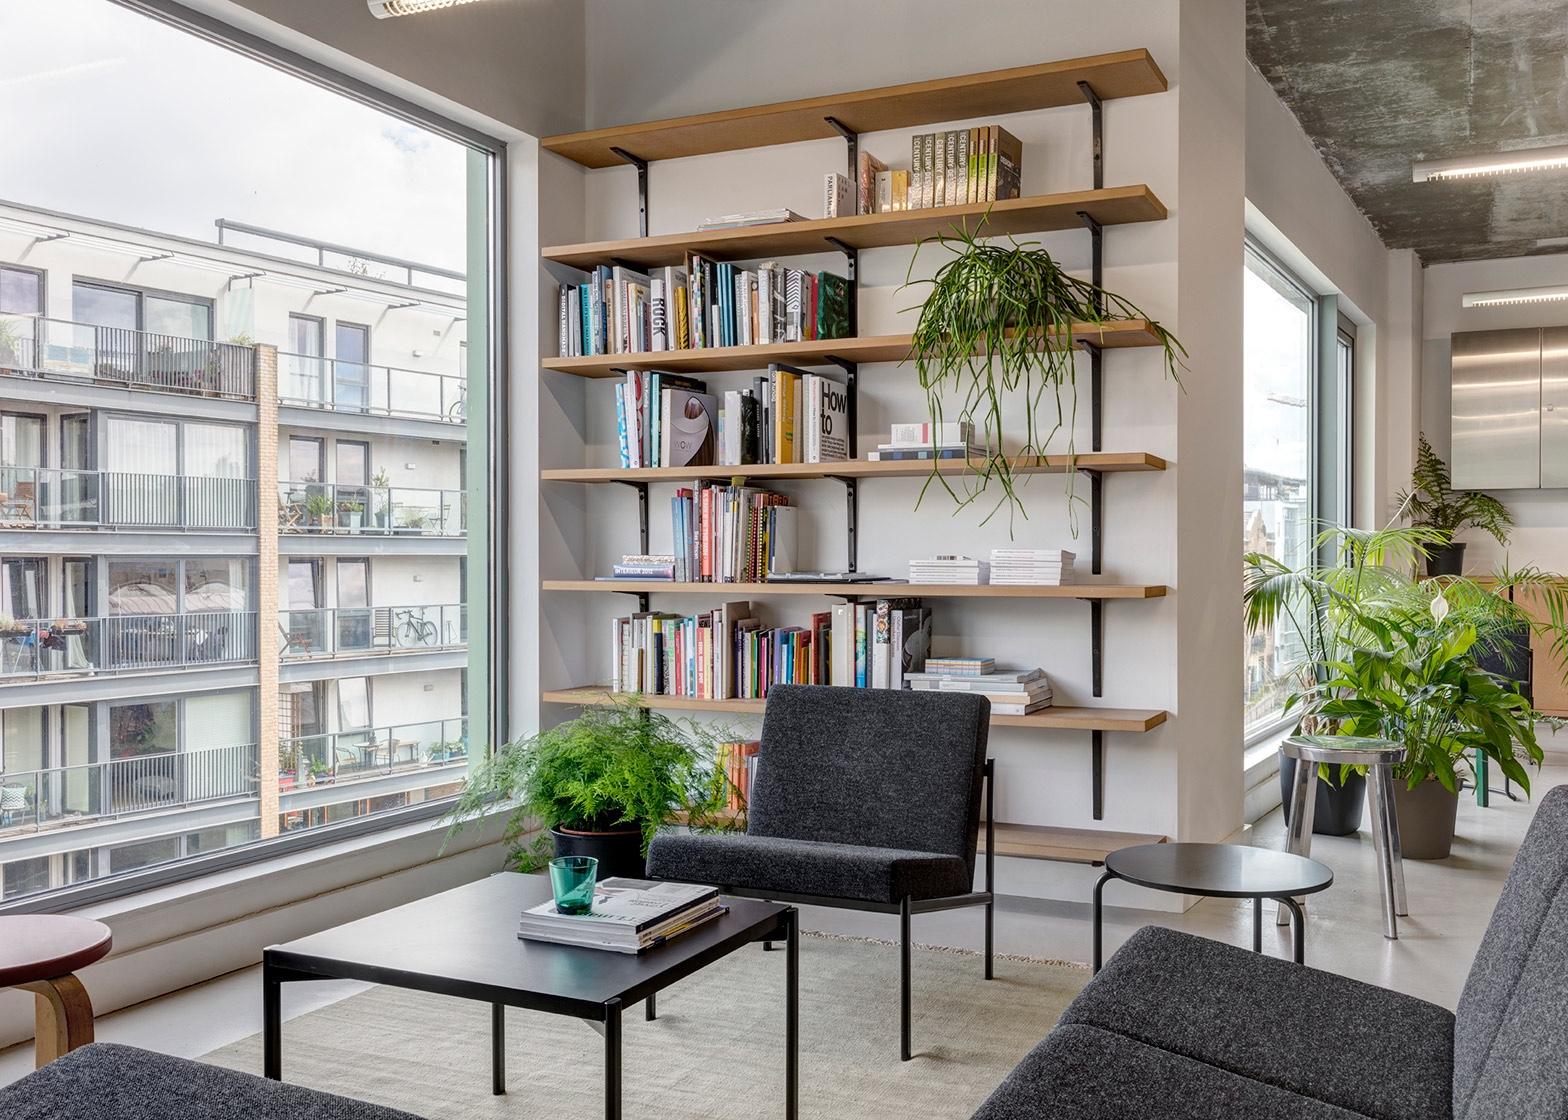 The multi-use lounge area of Dezeen's officeincludesIlmari Tapiovaara's Kiki sofa and armchairs and Aino Aalto's 606 Side Table.Image via Dezeen.